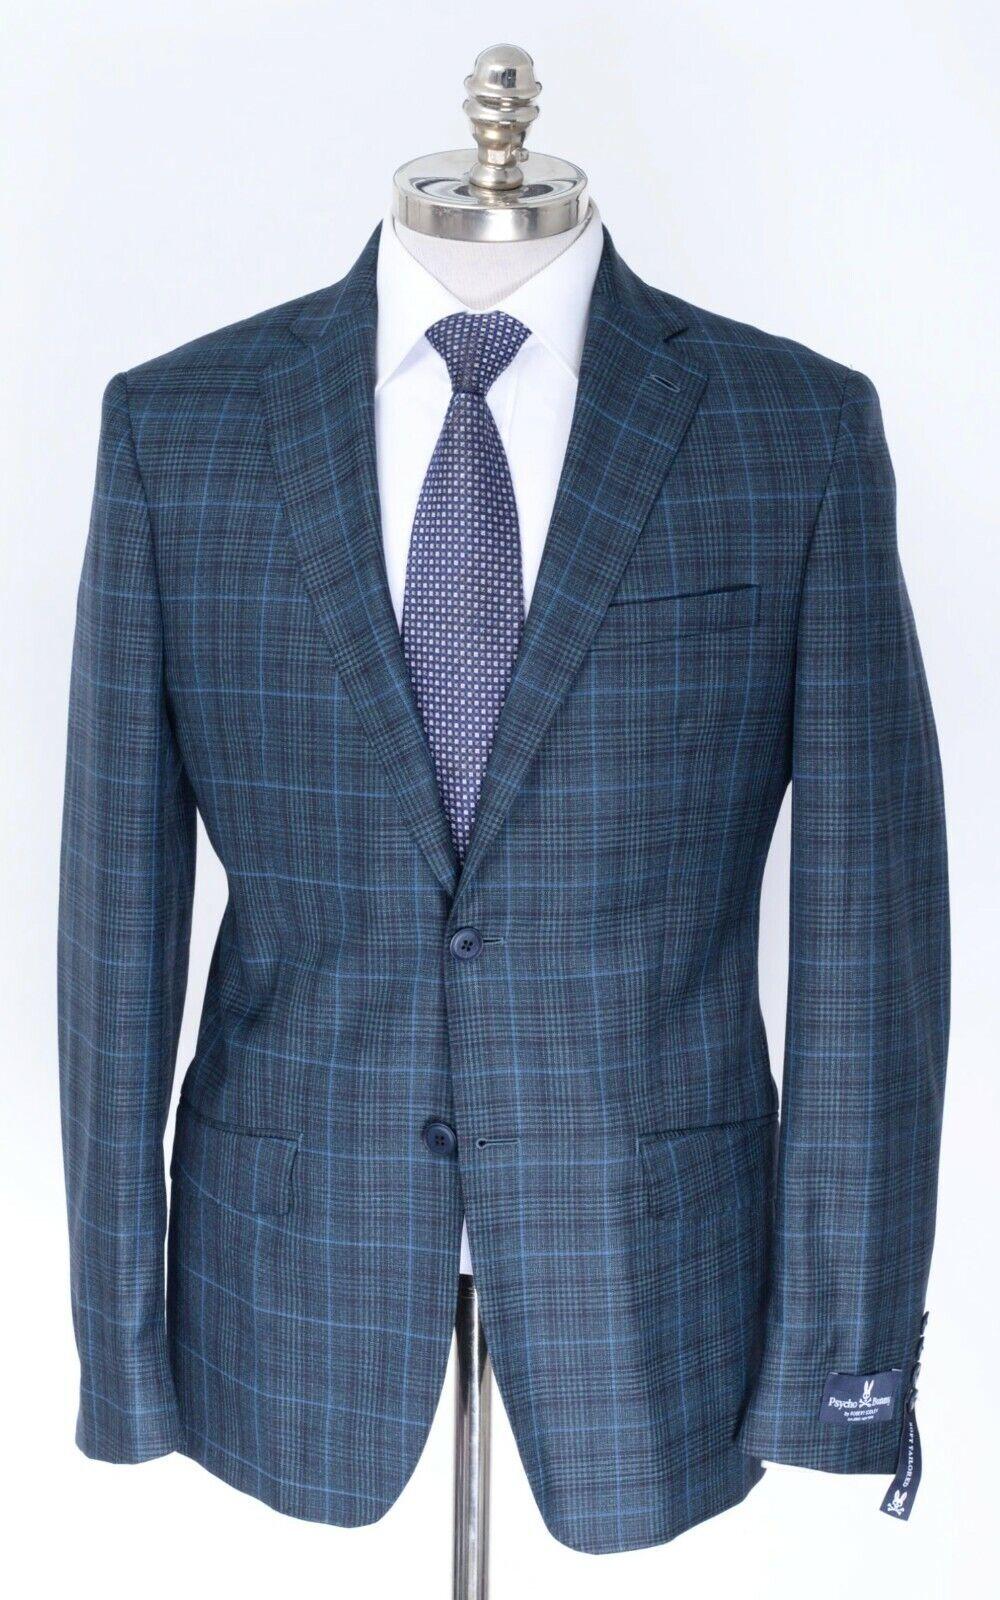 NWT PSYCHO BUNNY by Robert Godley Green Glen Check Wool Sport Coat 40 R (EU 50)